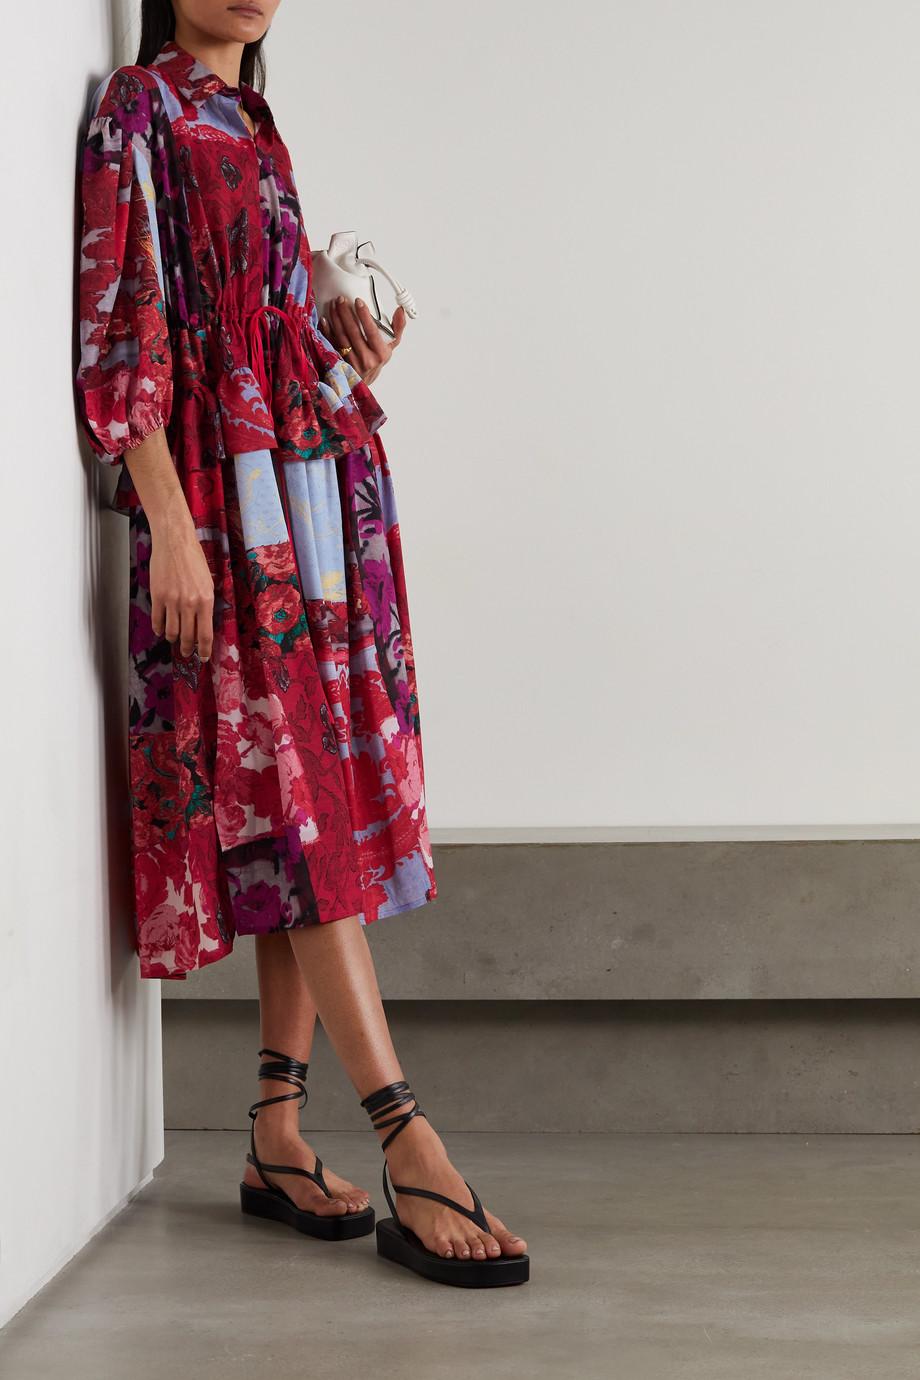 Preen by Thornton Bregazzi Dorchen patchwork floral-print recycled crepe de chine dress